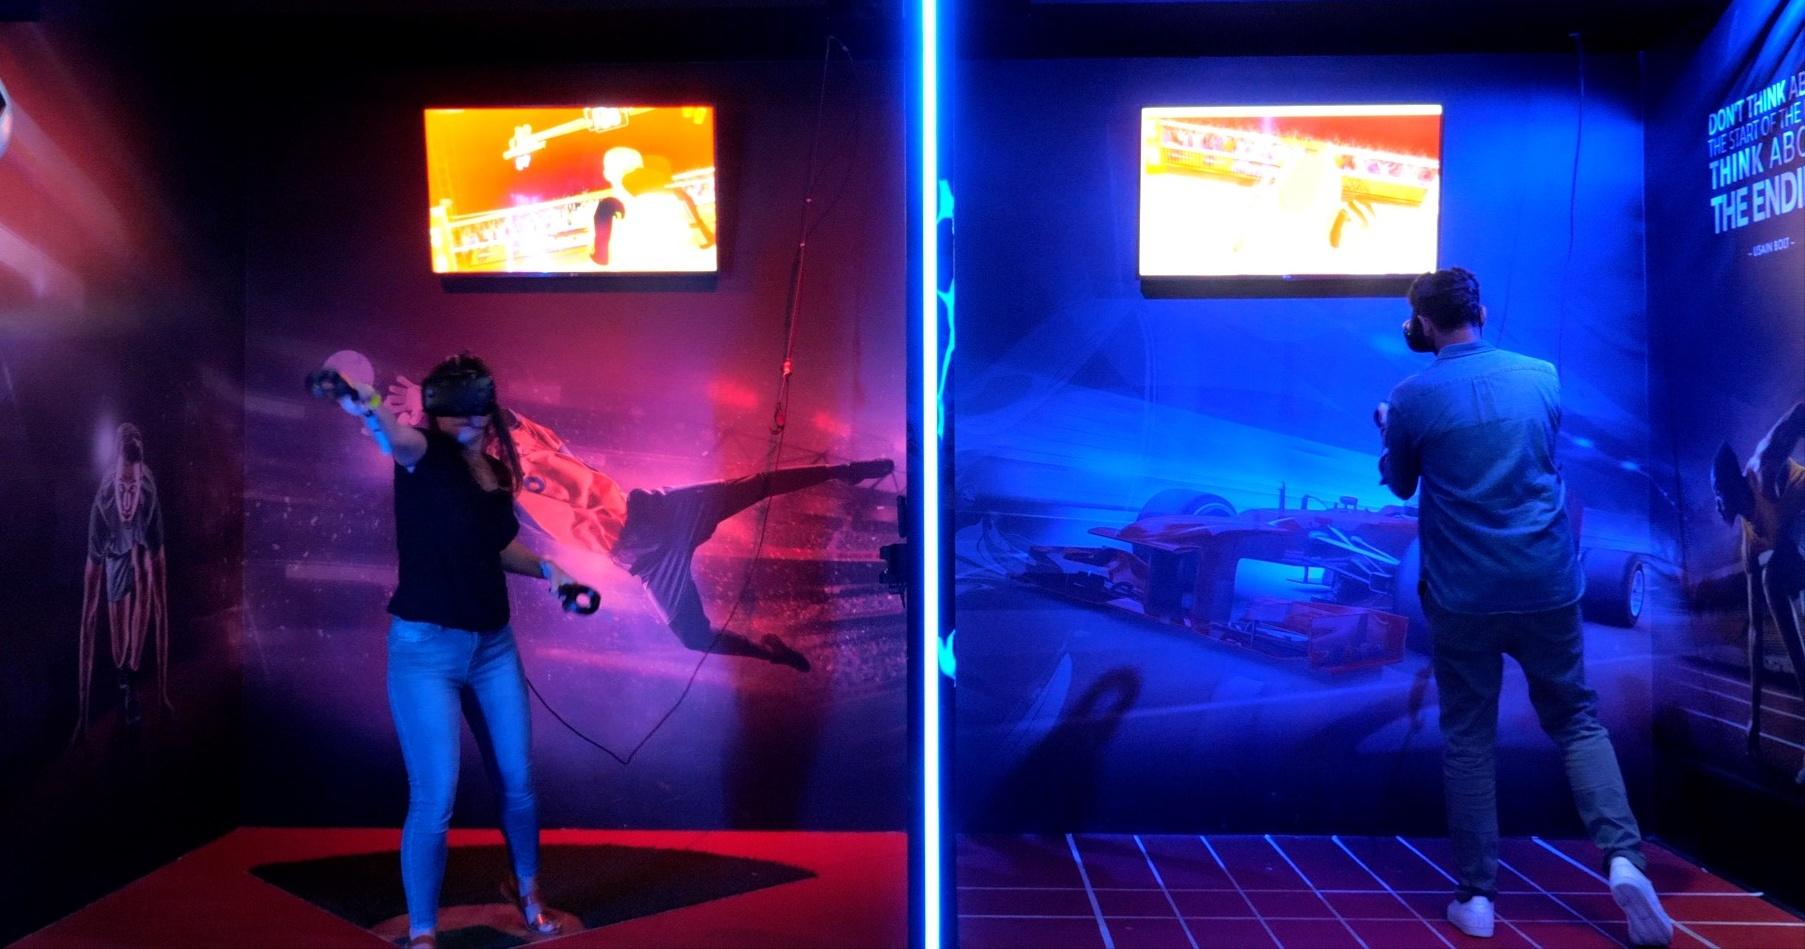 VR Park Dubai at The Dubai Mall